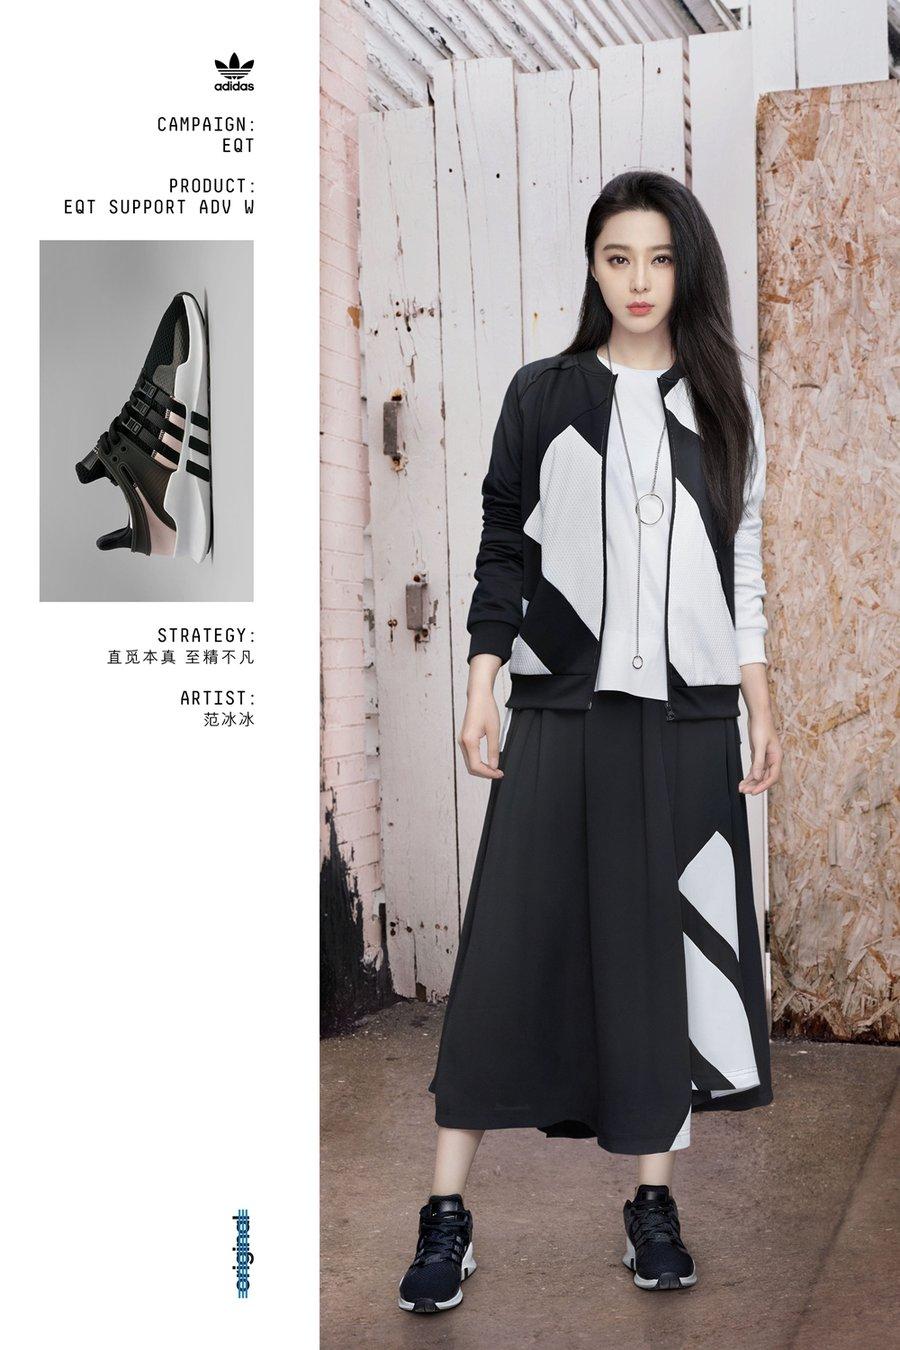 adidas,EQT  至精不凡!陈奕迅、水原希子等潮流 Icon 演绎 EQT 全新系列